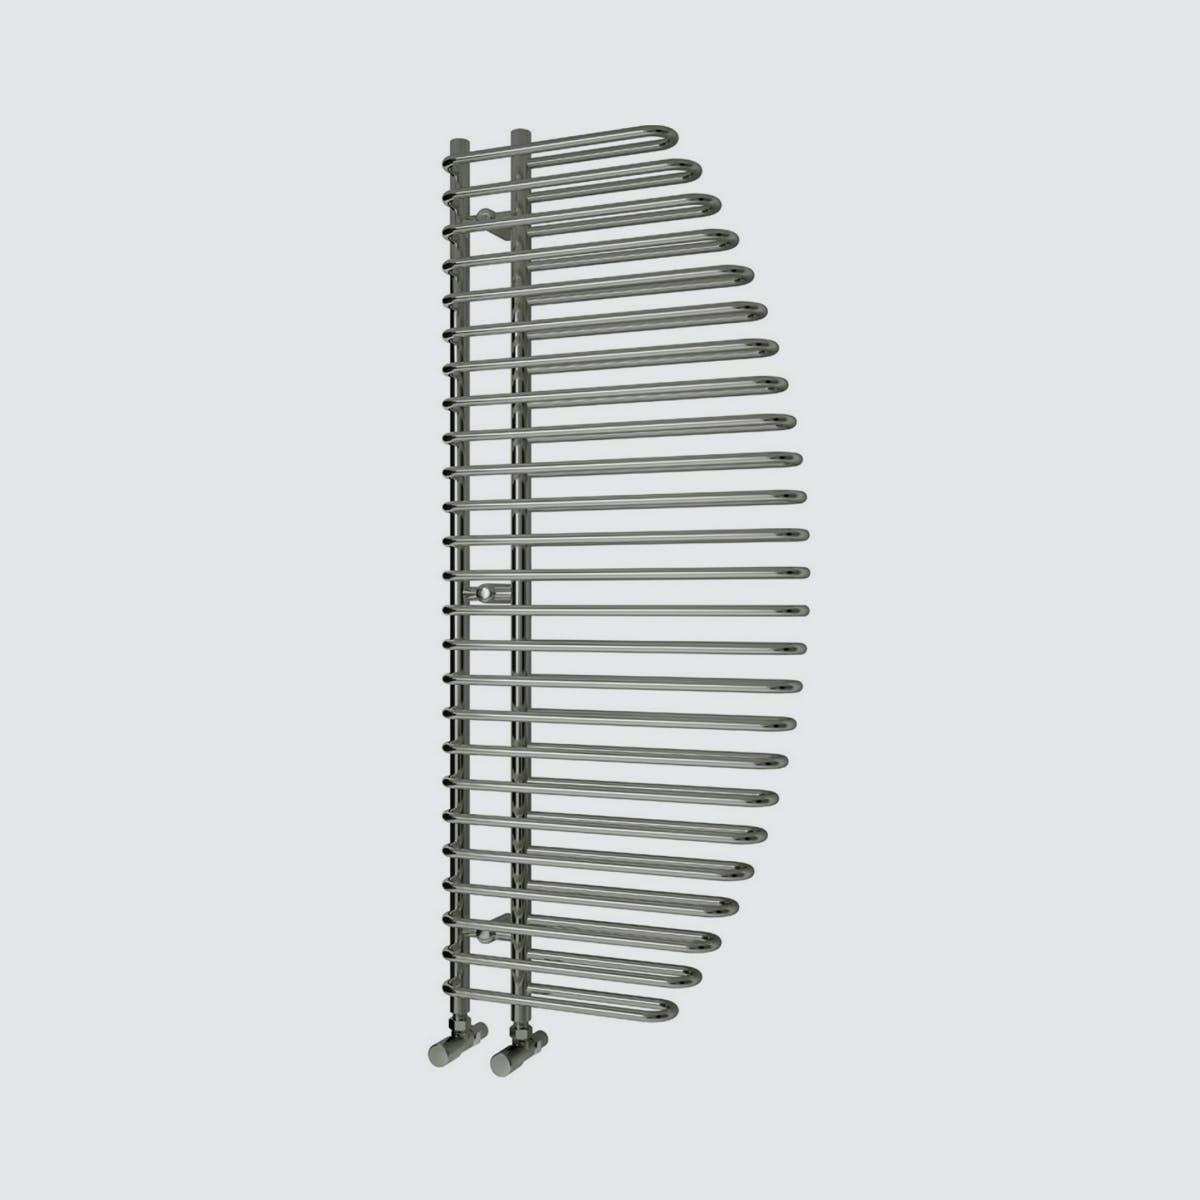 Reina designer heating range